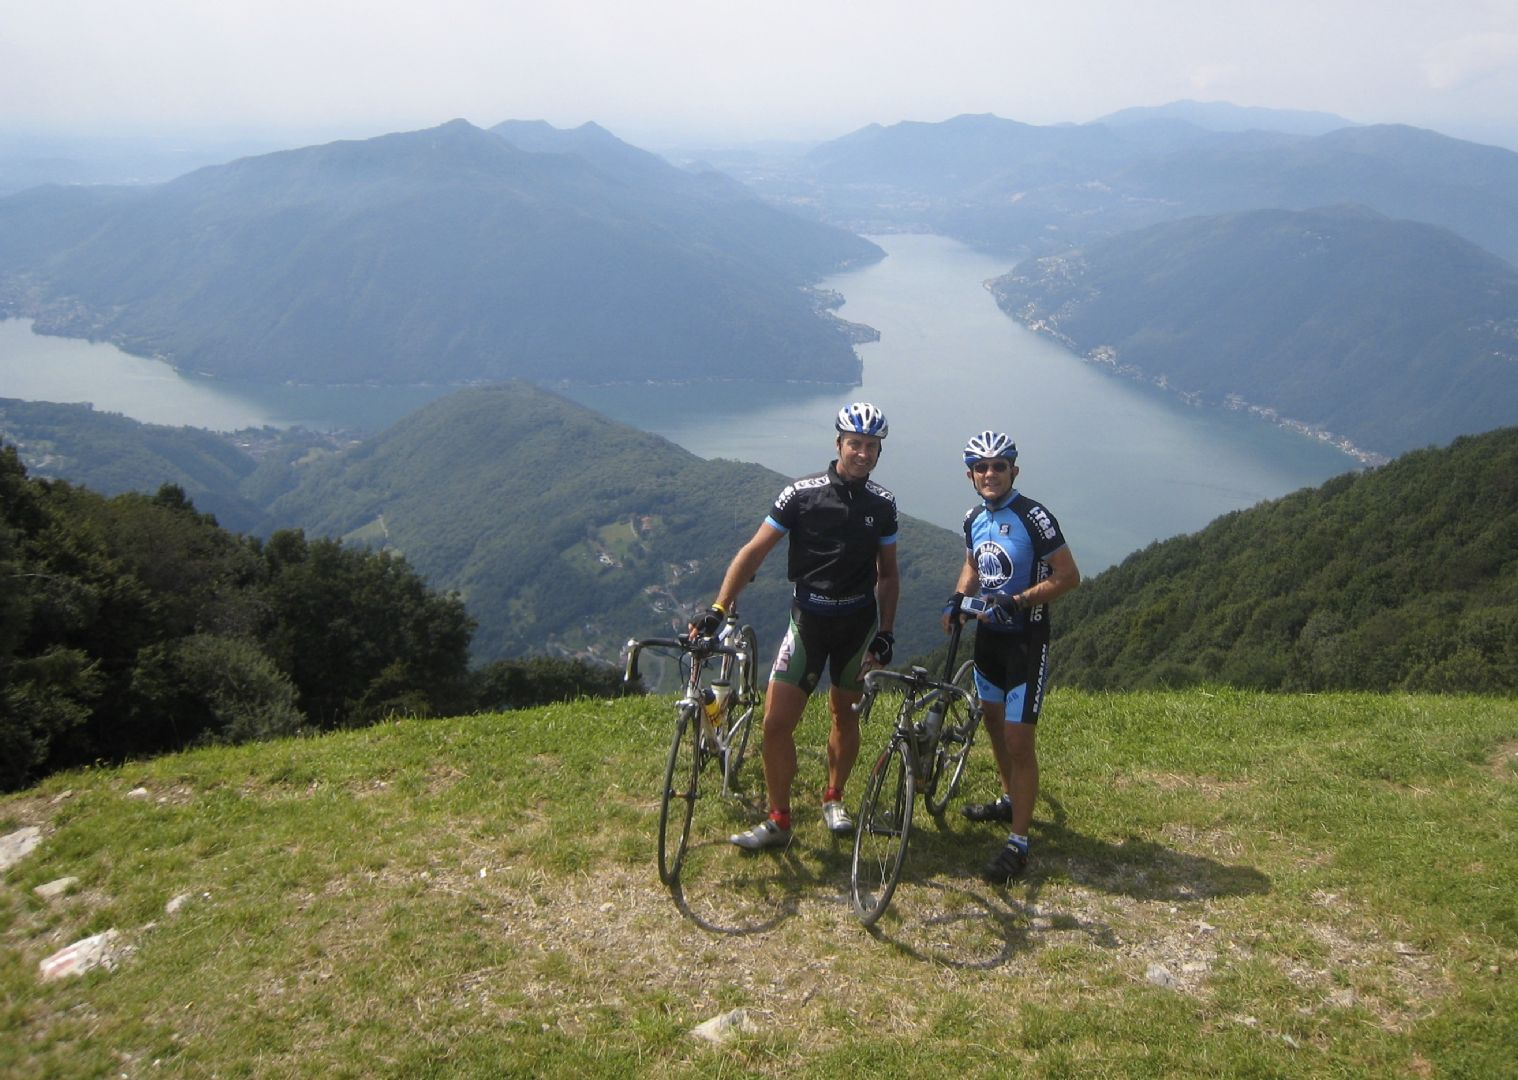 Immagine 379.jpg - Italy - Lakes of Lombardia - Guided Road Cycling Holiday - Road Cycling